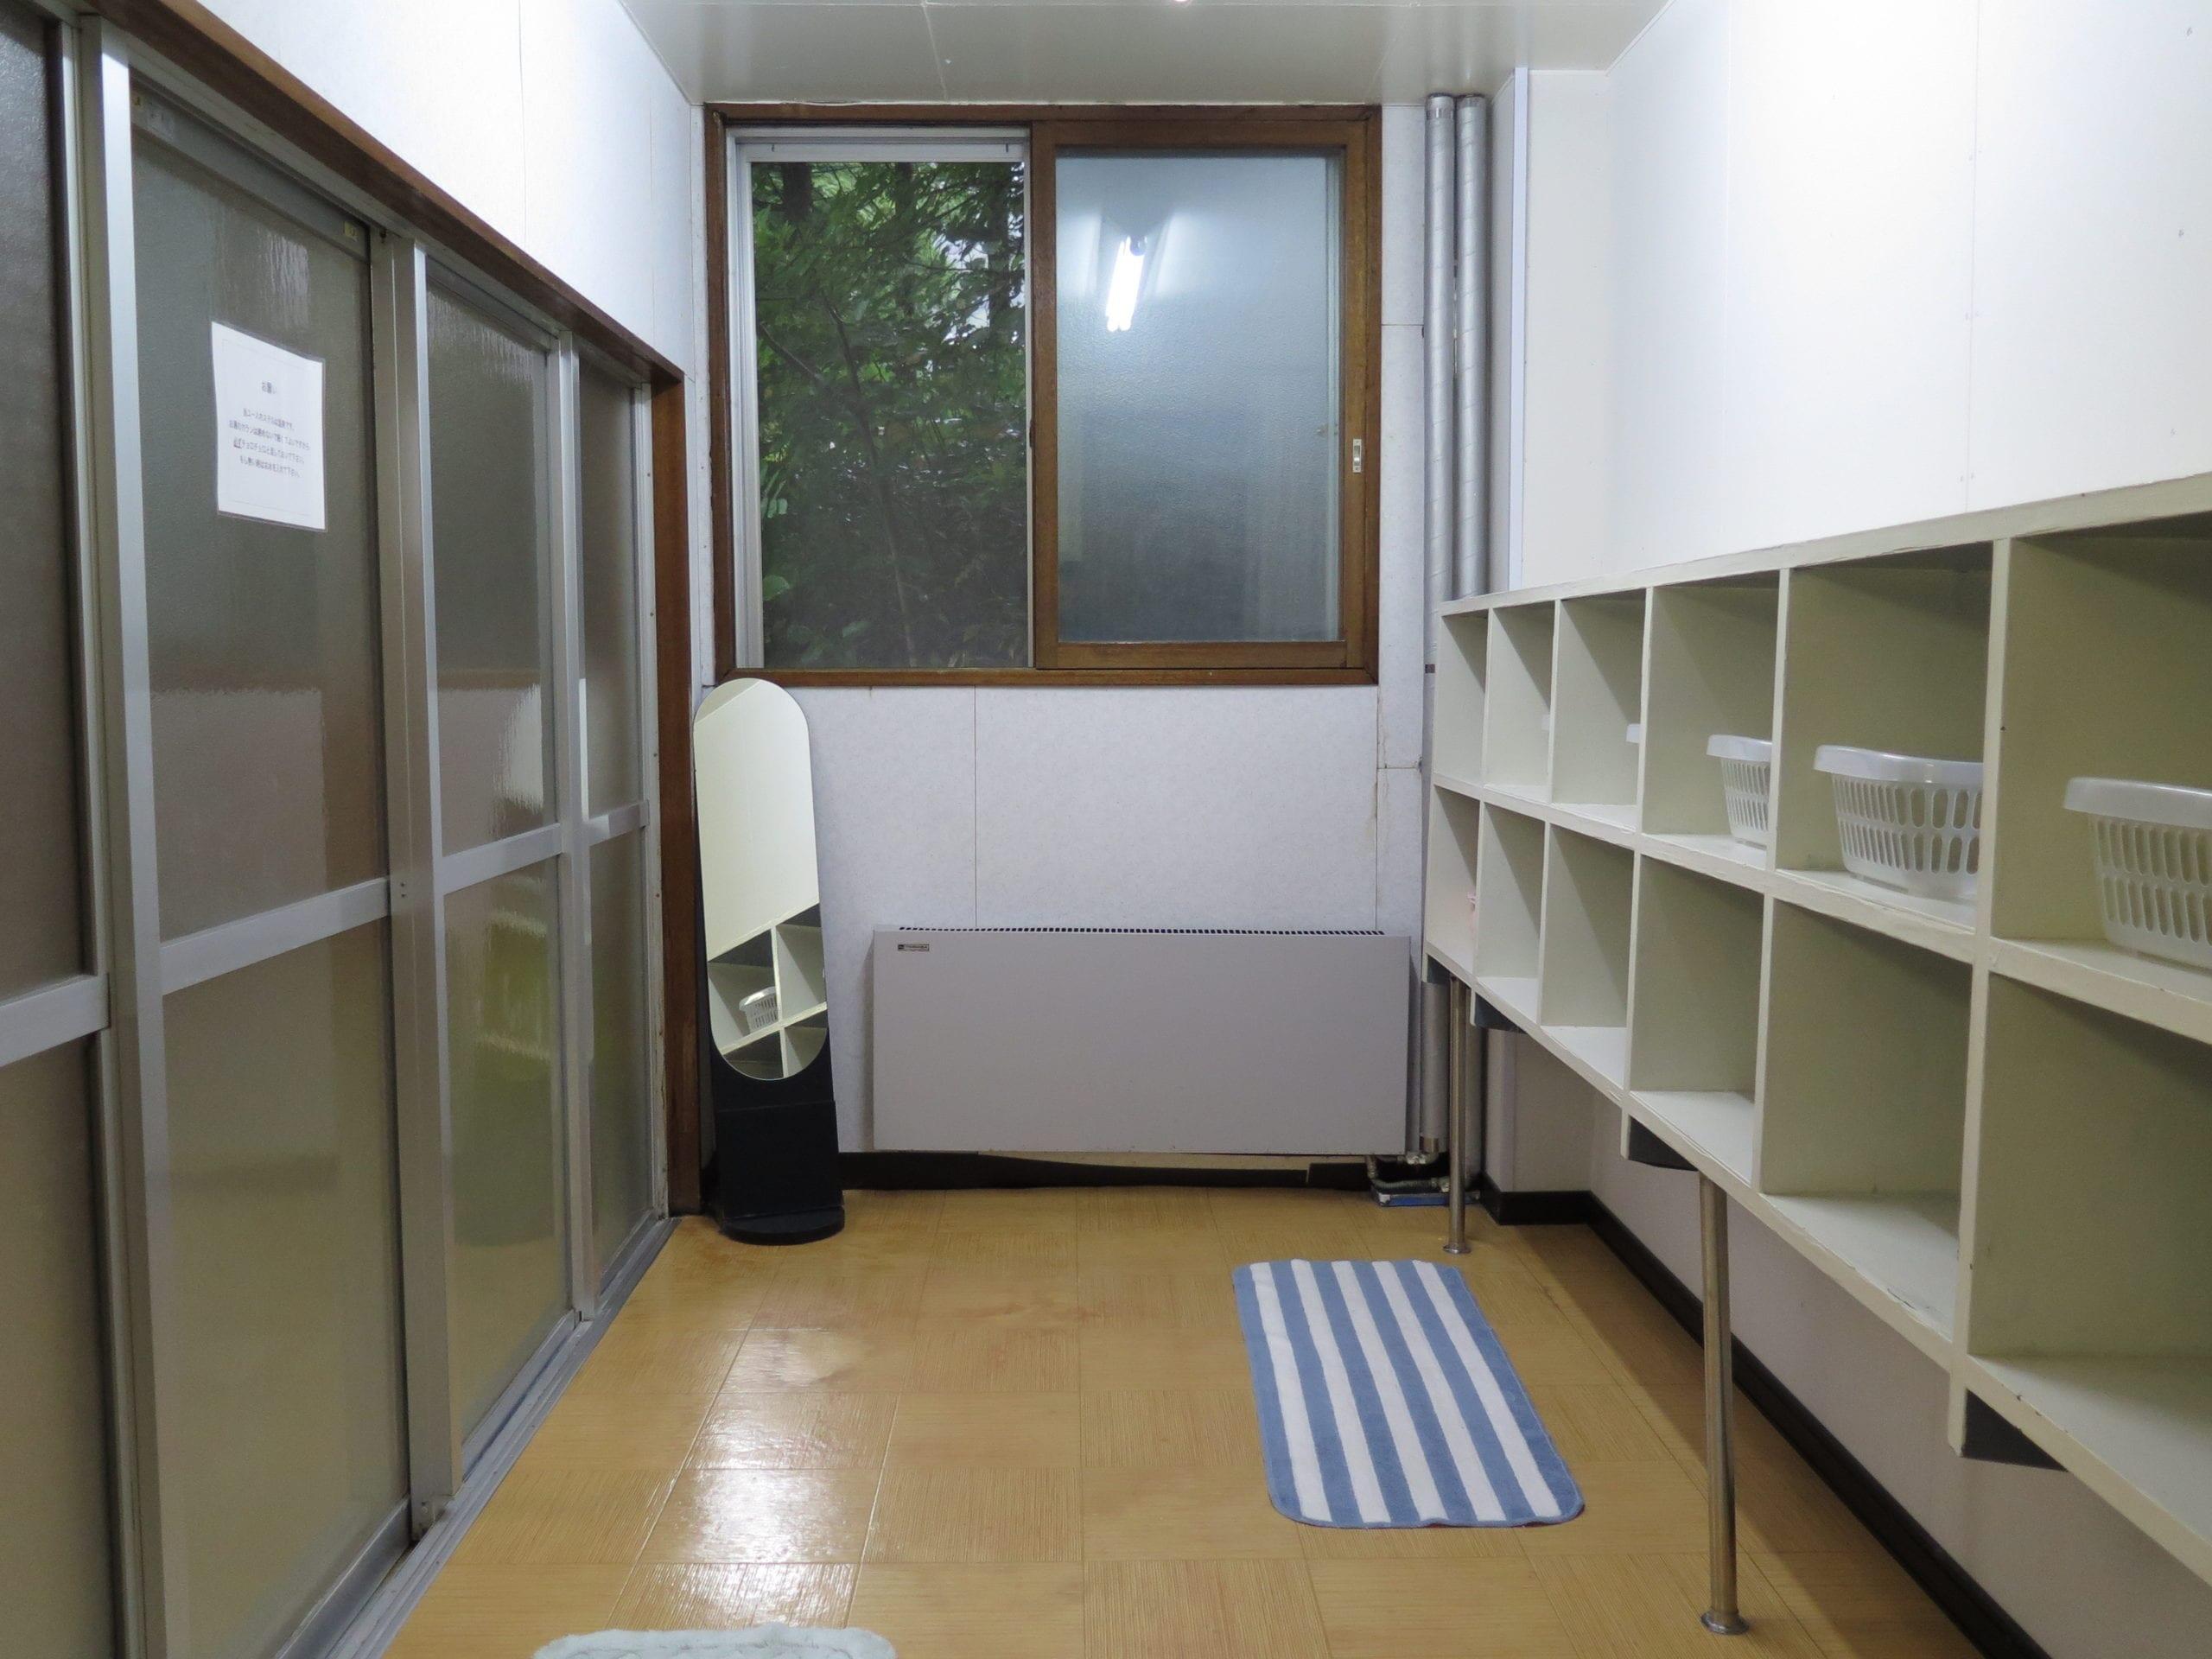 How a typical Japanese share house bathroom looks